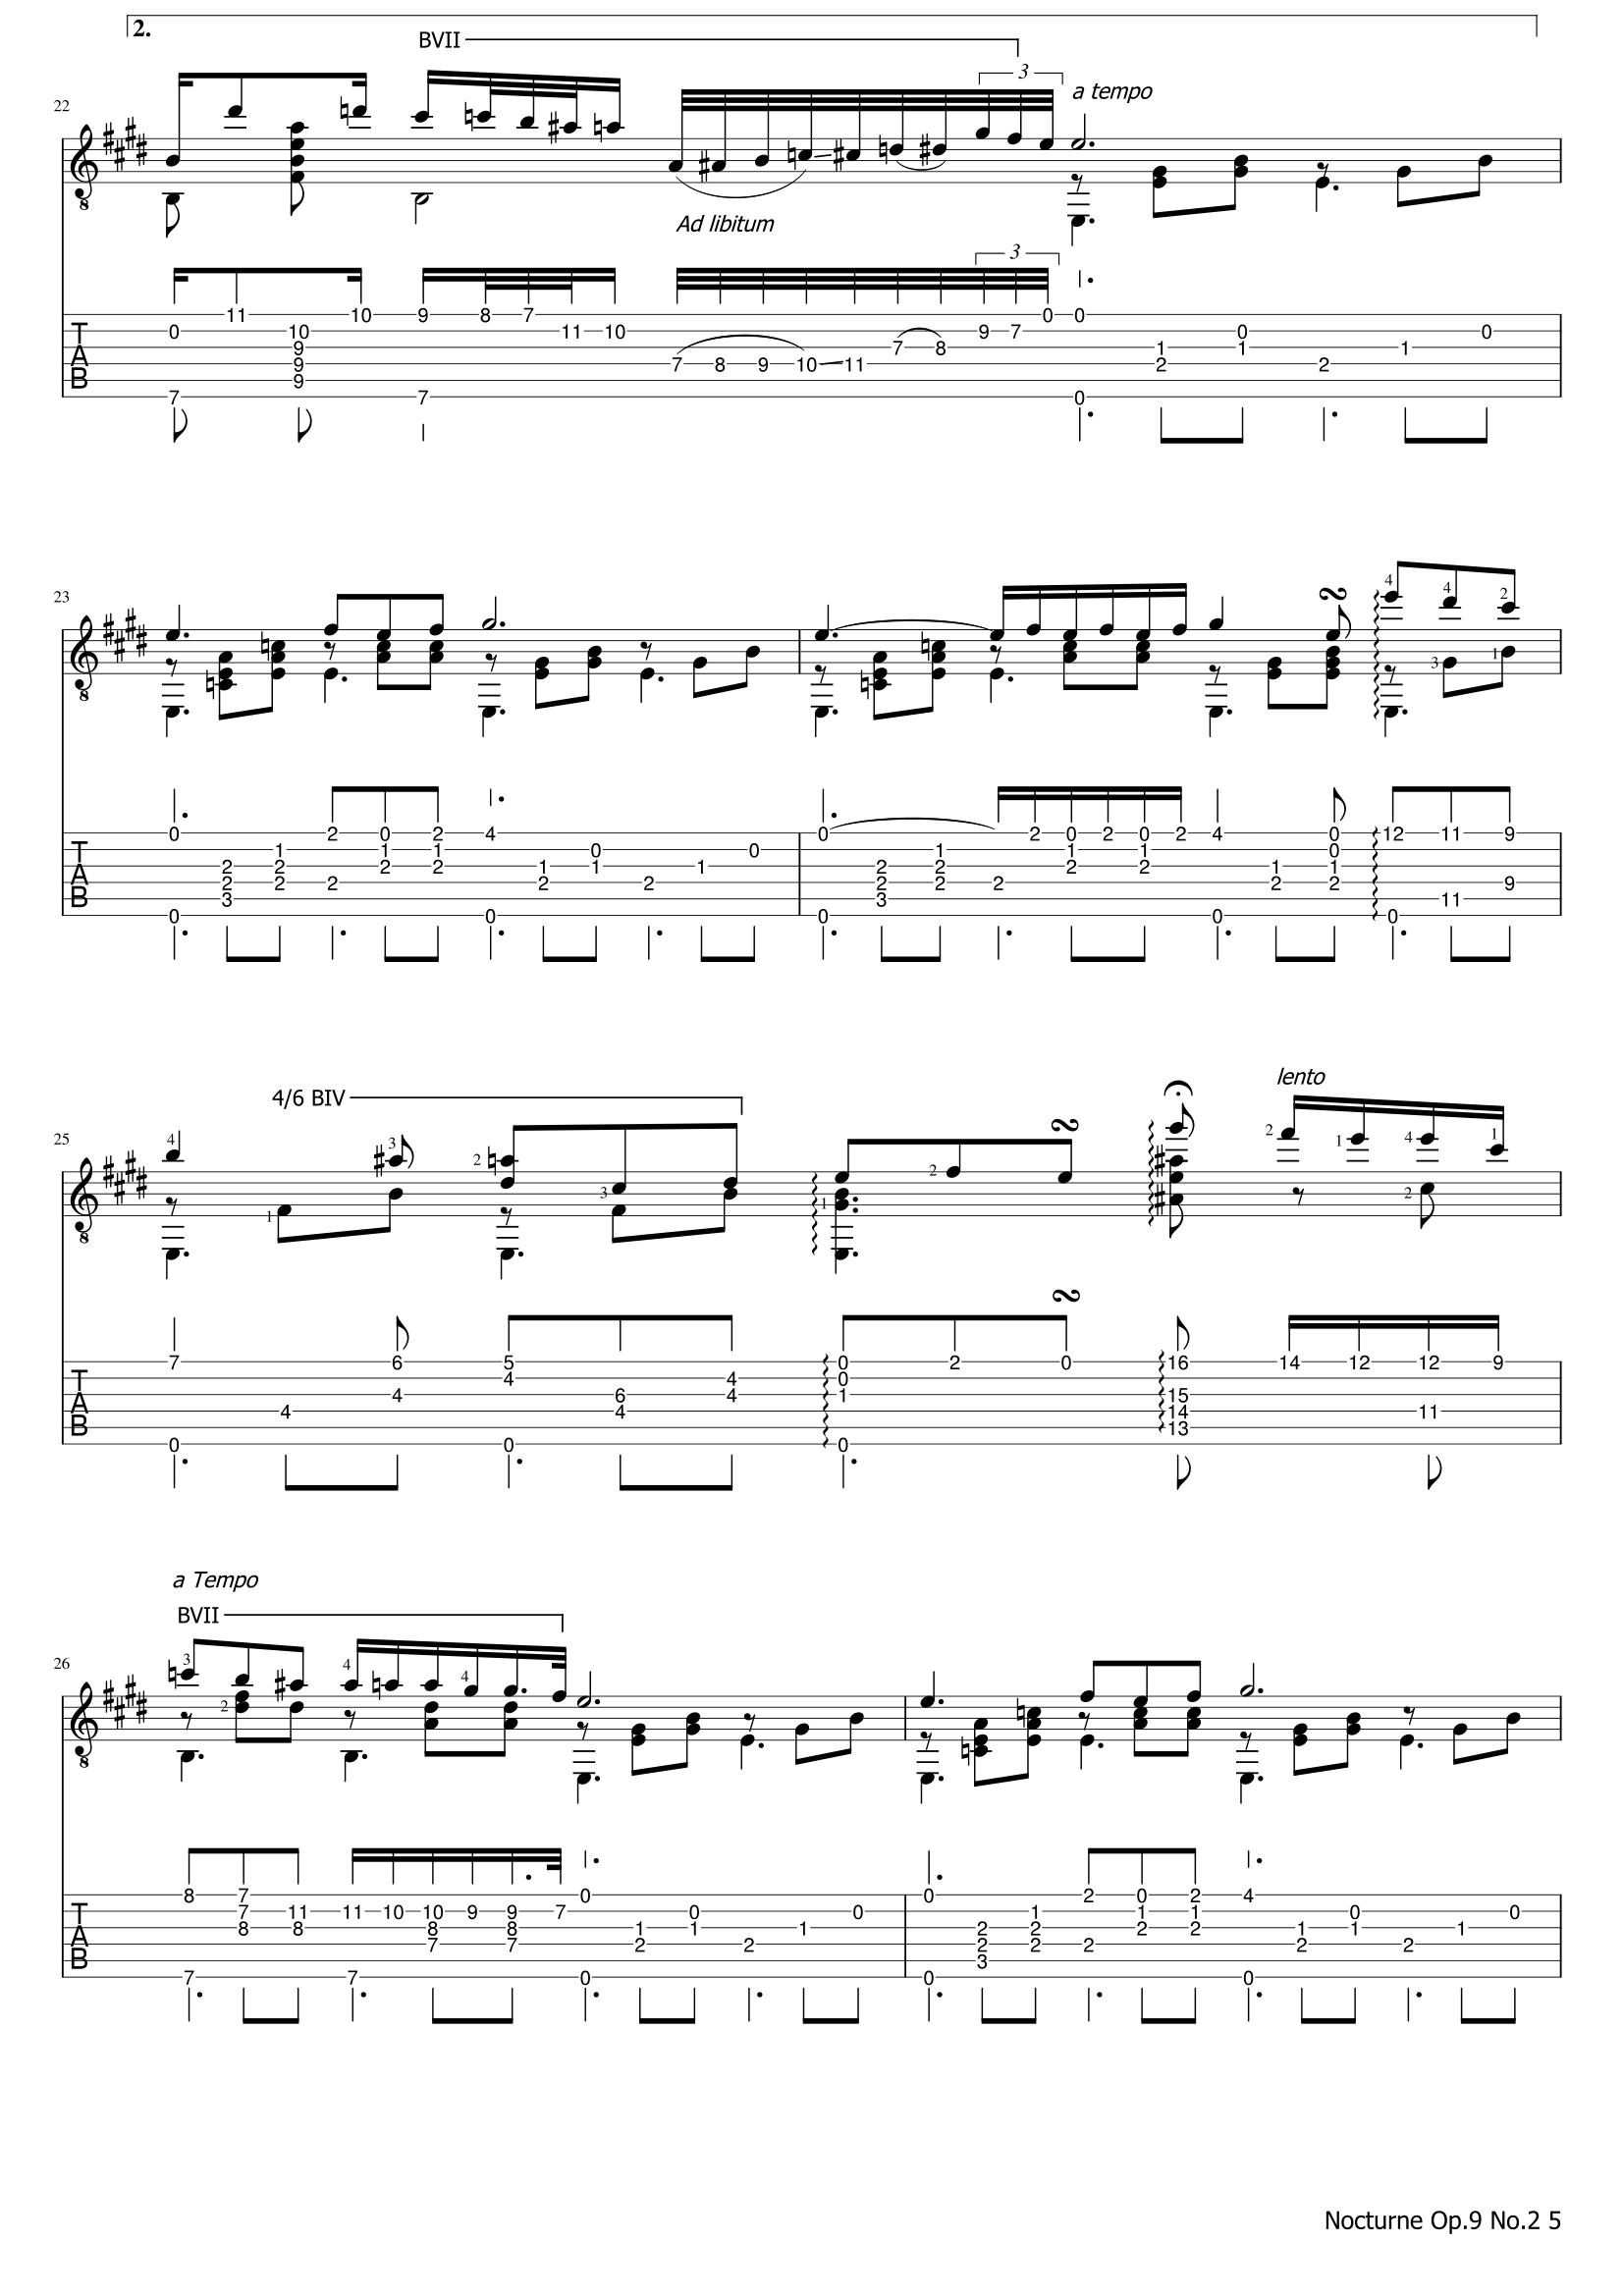 5 - Nocturne Op.9 No.2.png